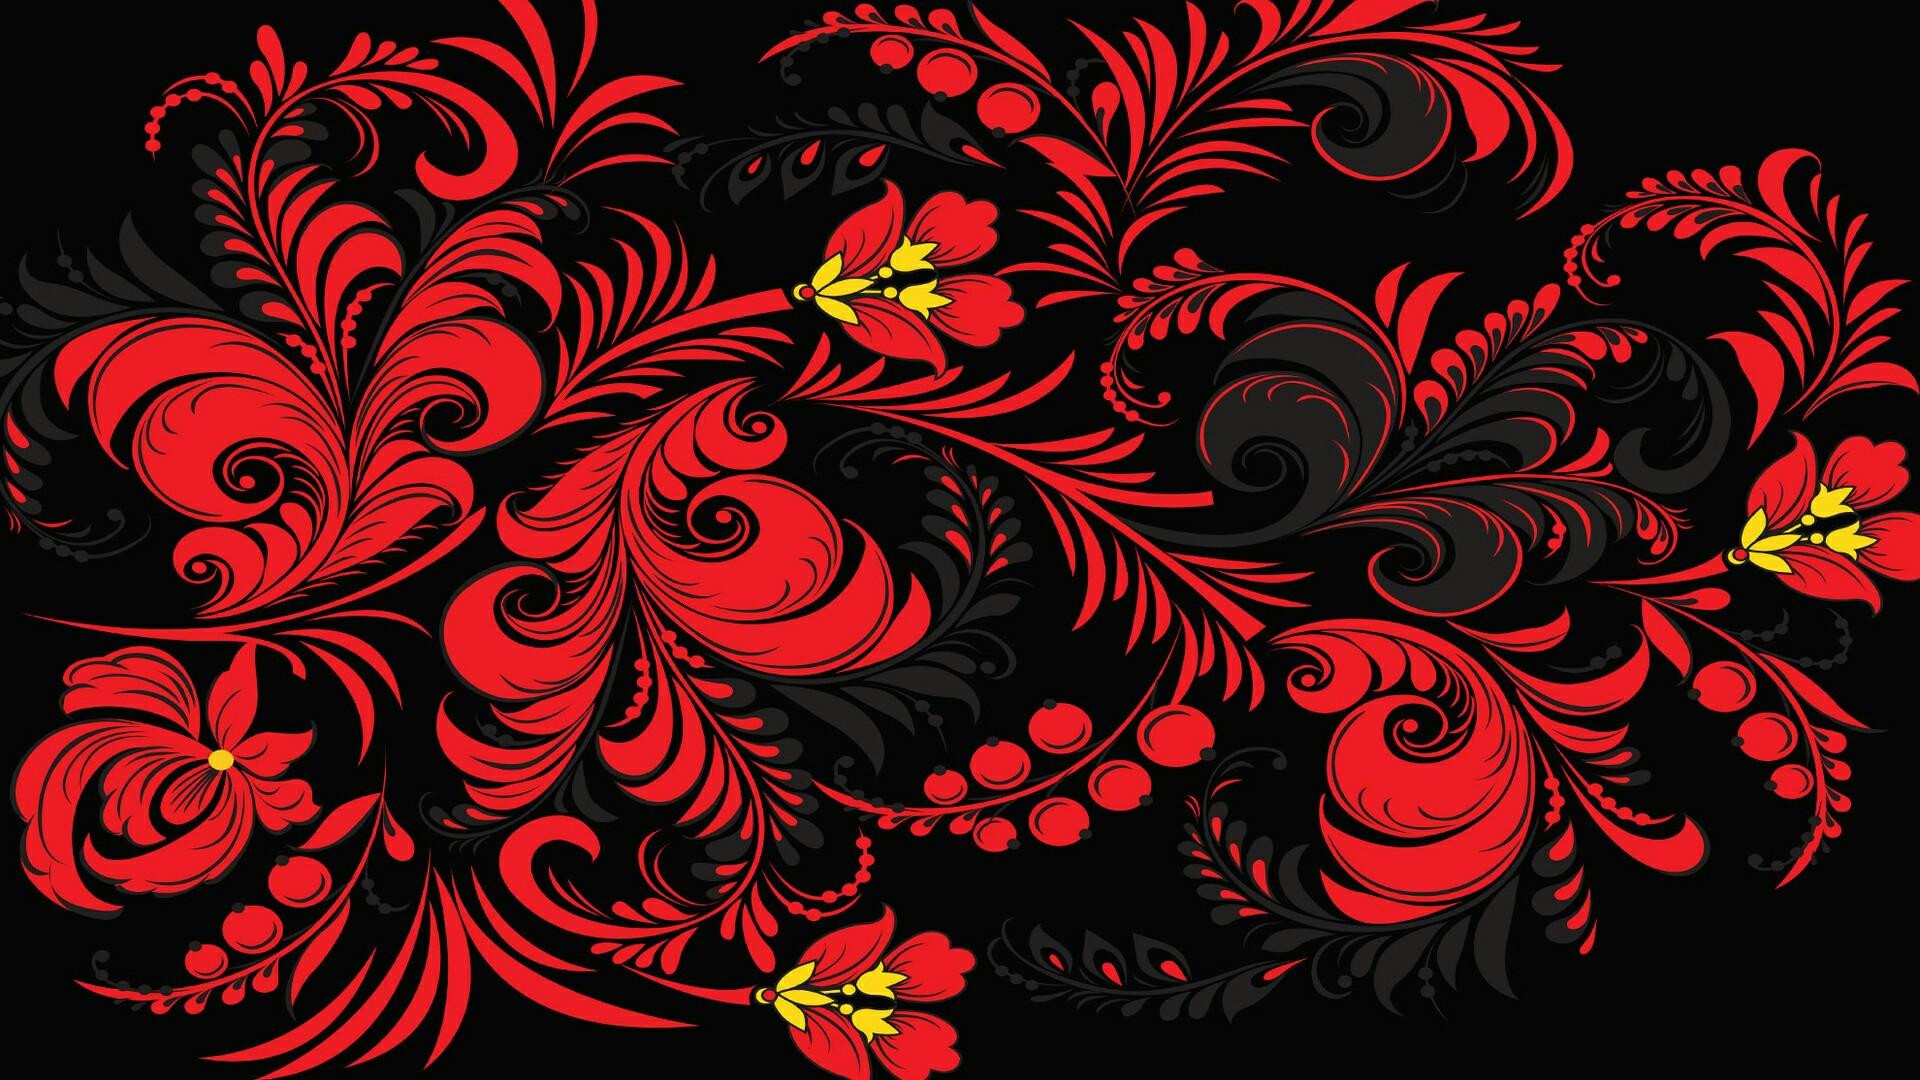 ebddcbdbfbbbfbc-wallpaper-wp3605280